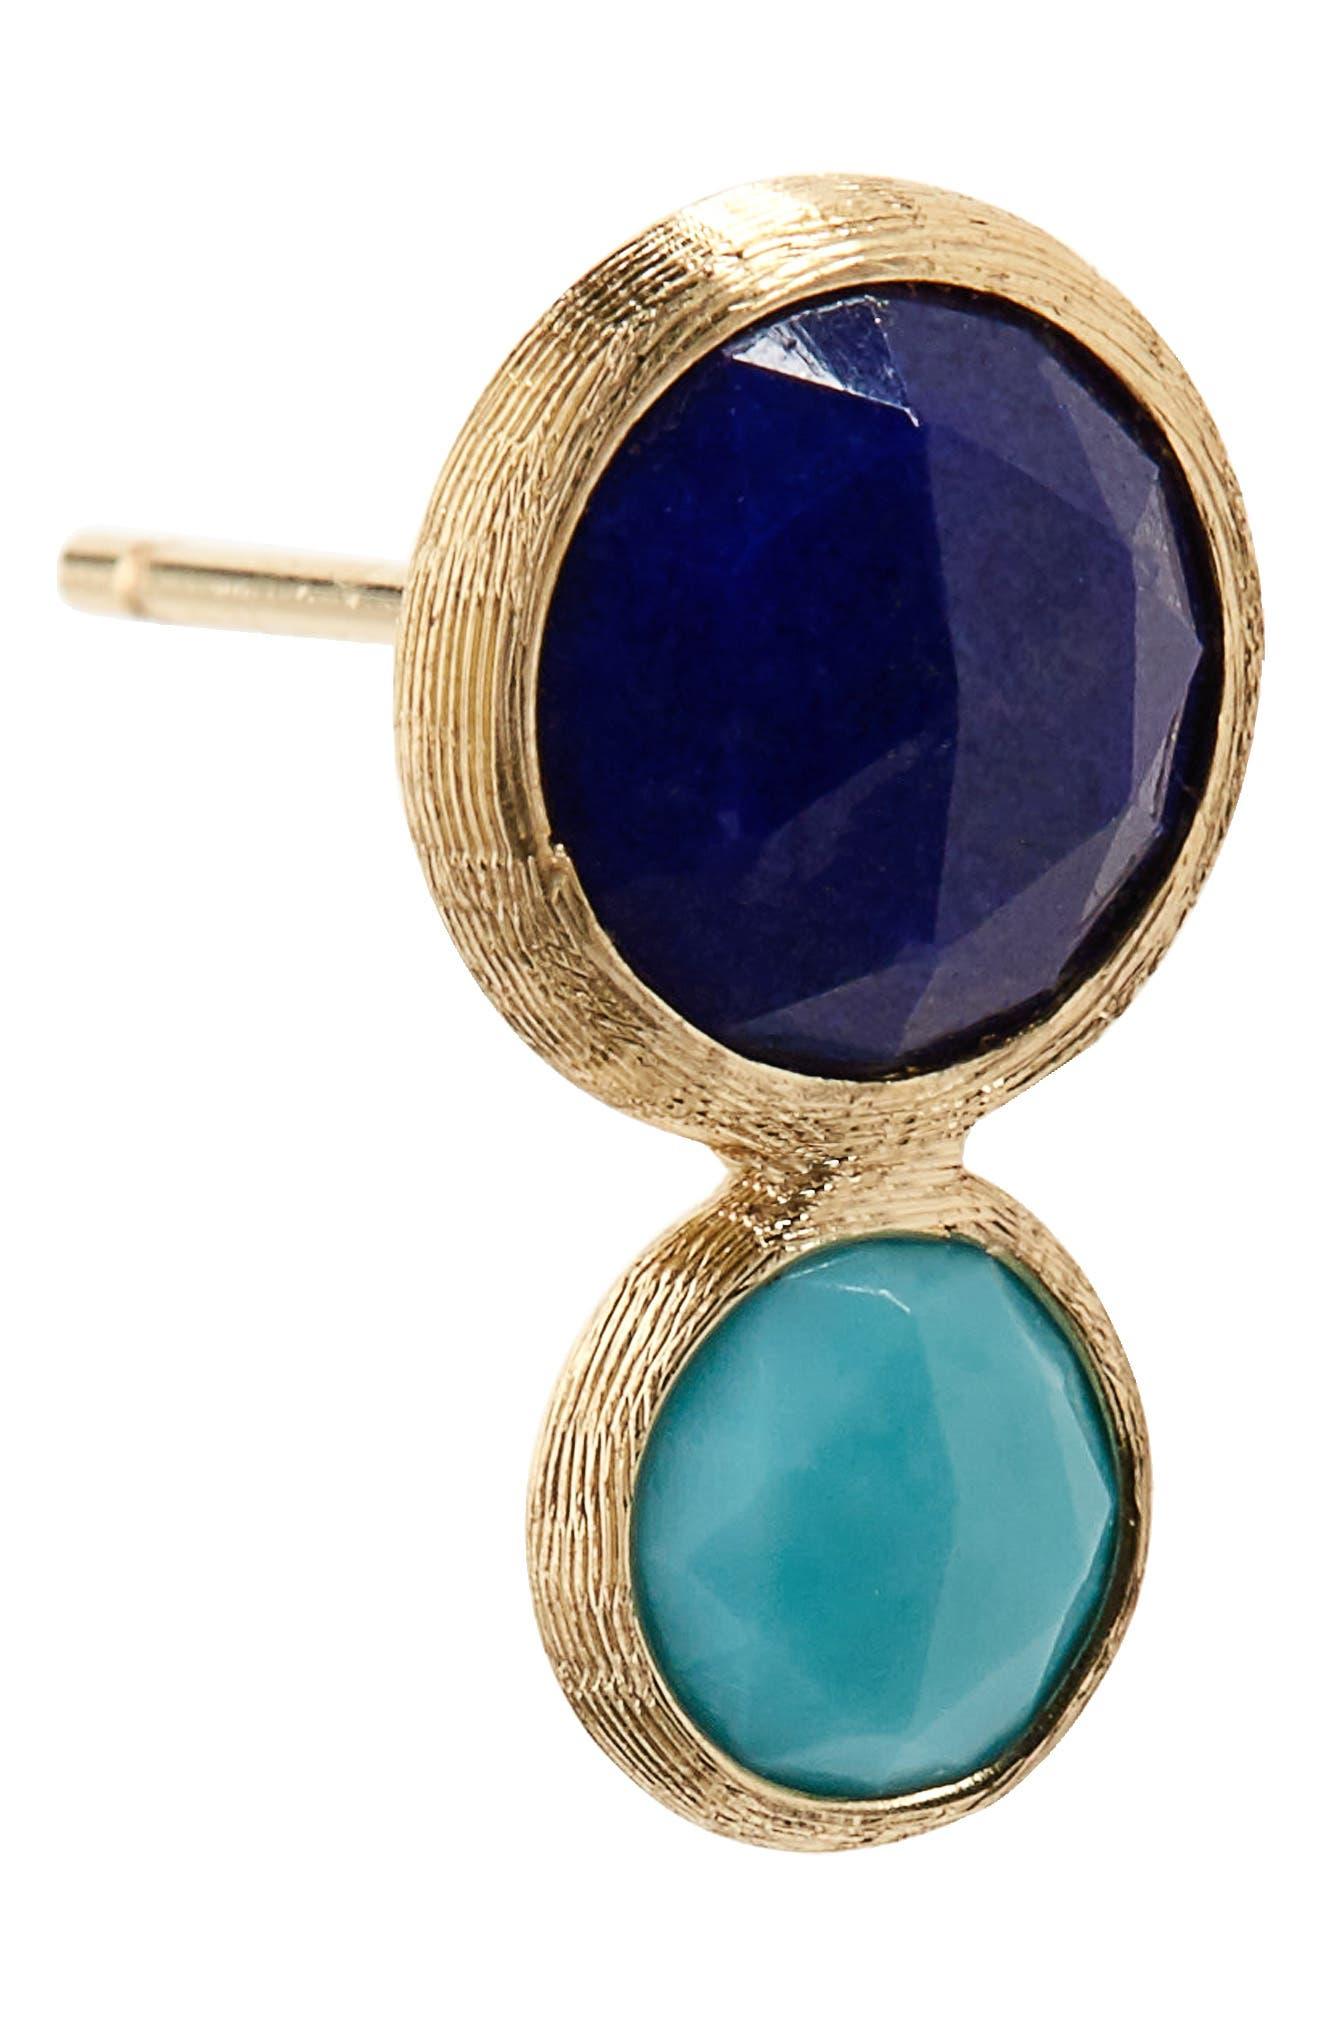 Jaipur Lapis & Turquoise Stud Earrings,                             Alternate thumbnail 5, color,                             Yellow Gold Lapis/ Turquoise